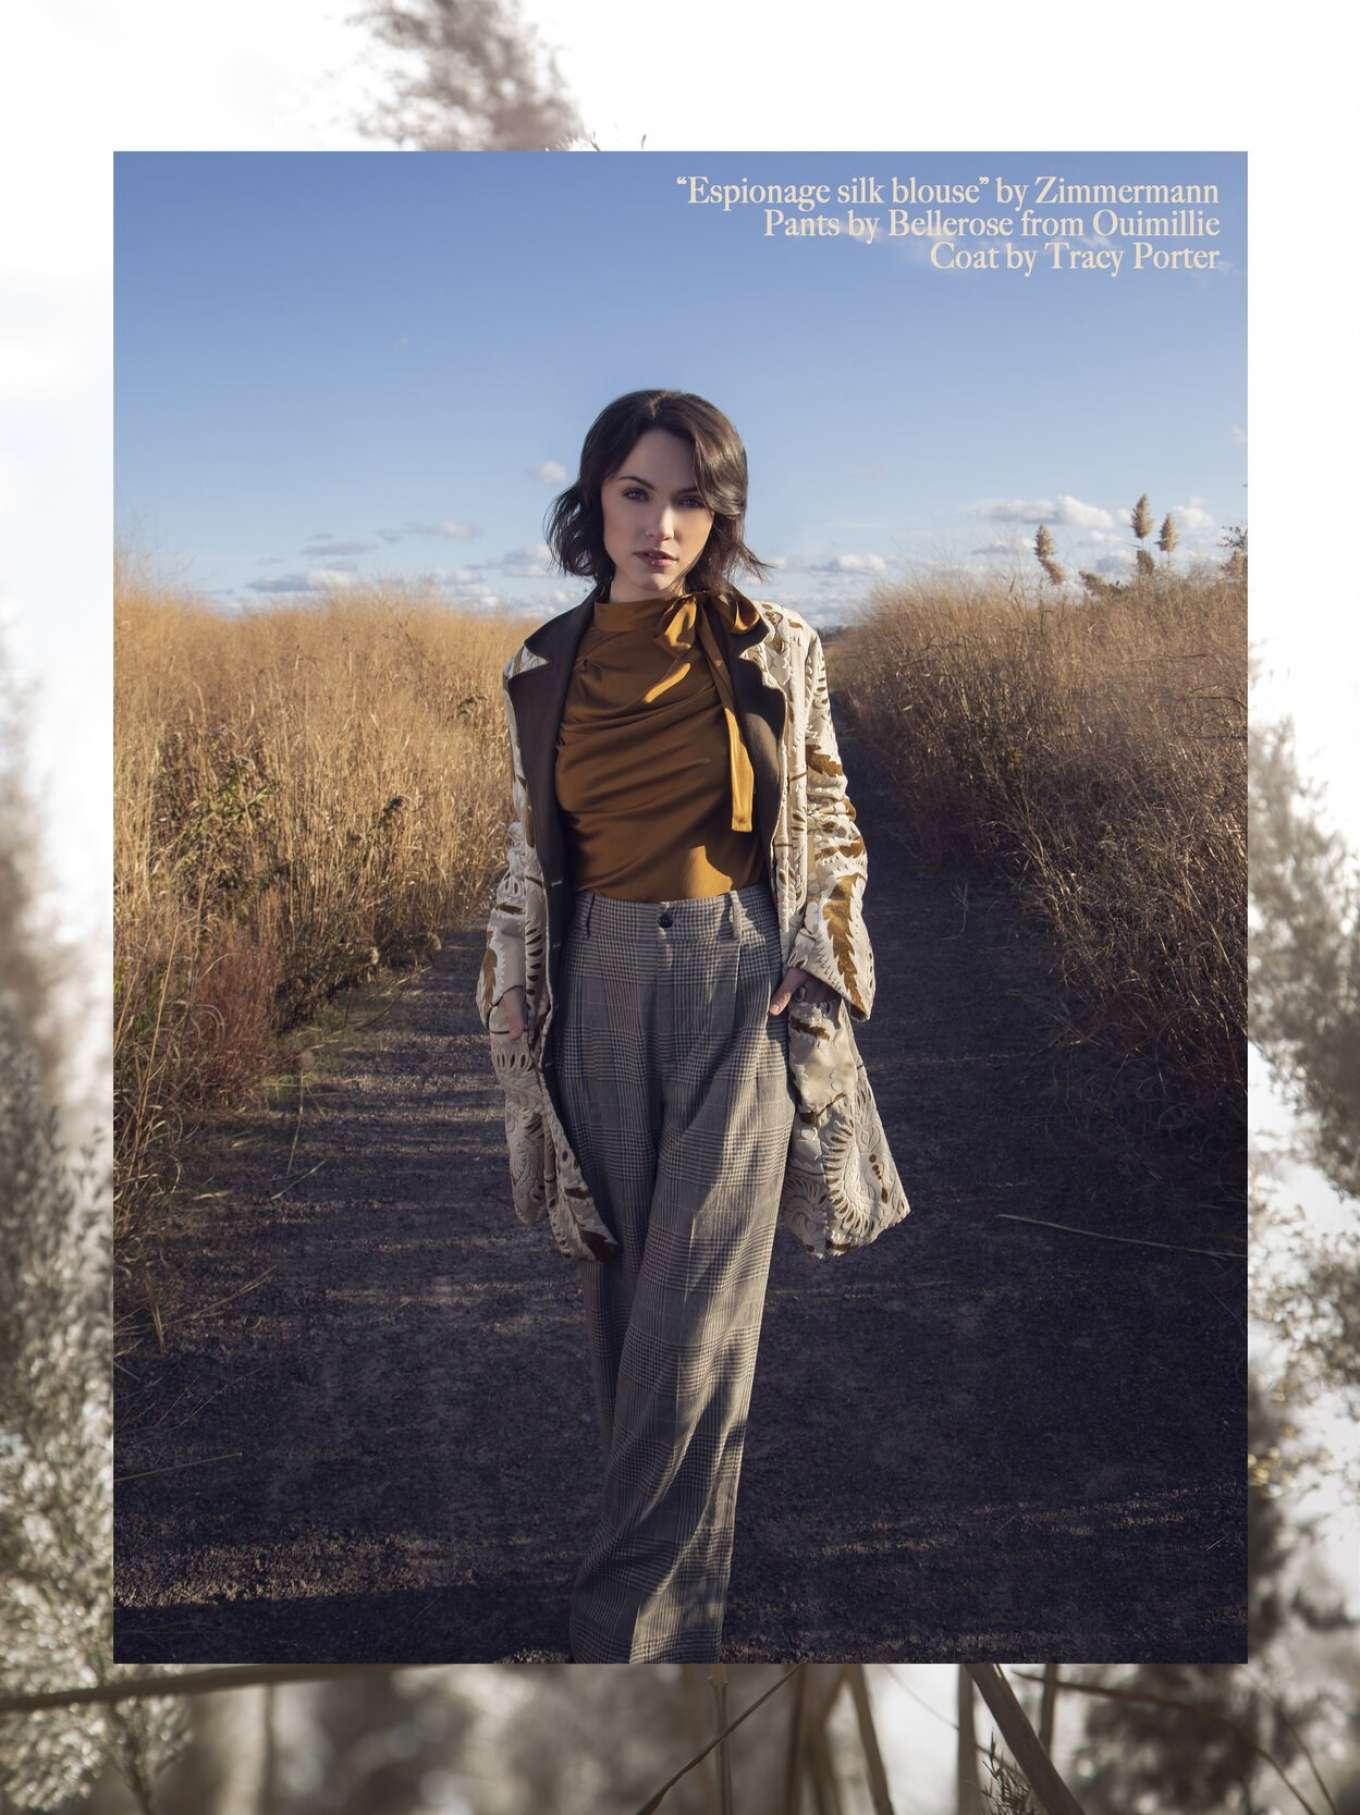 Violett Beane 2020 : Violett Beane – Jejune Magazine 2020-08